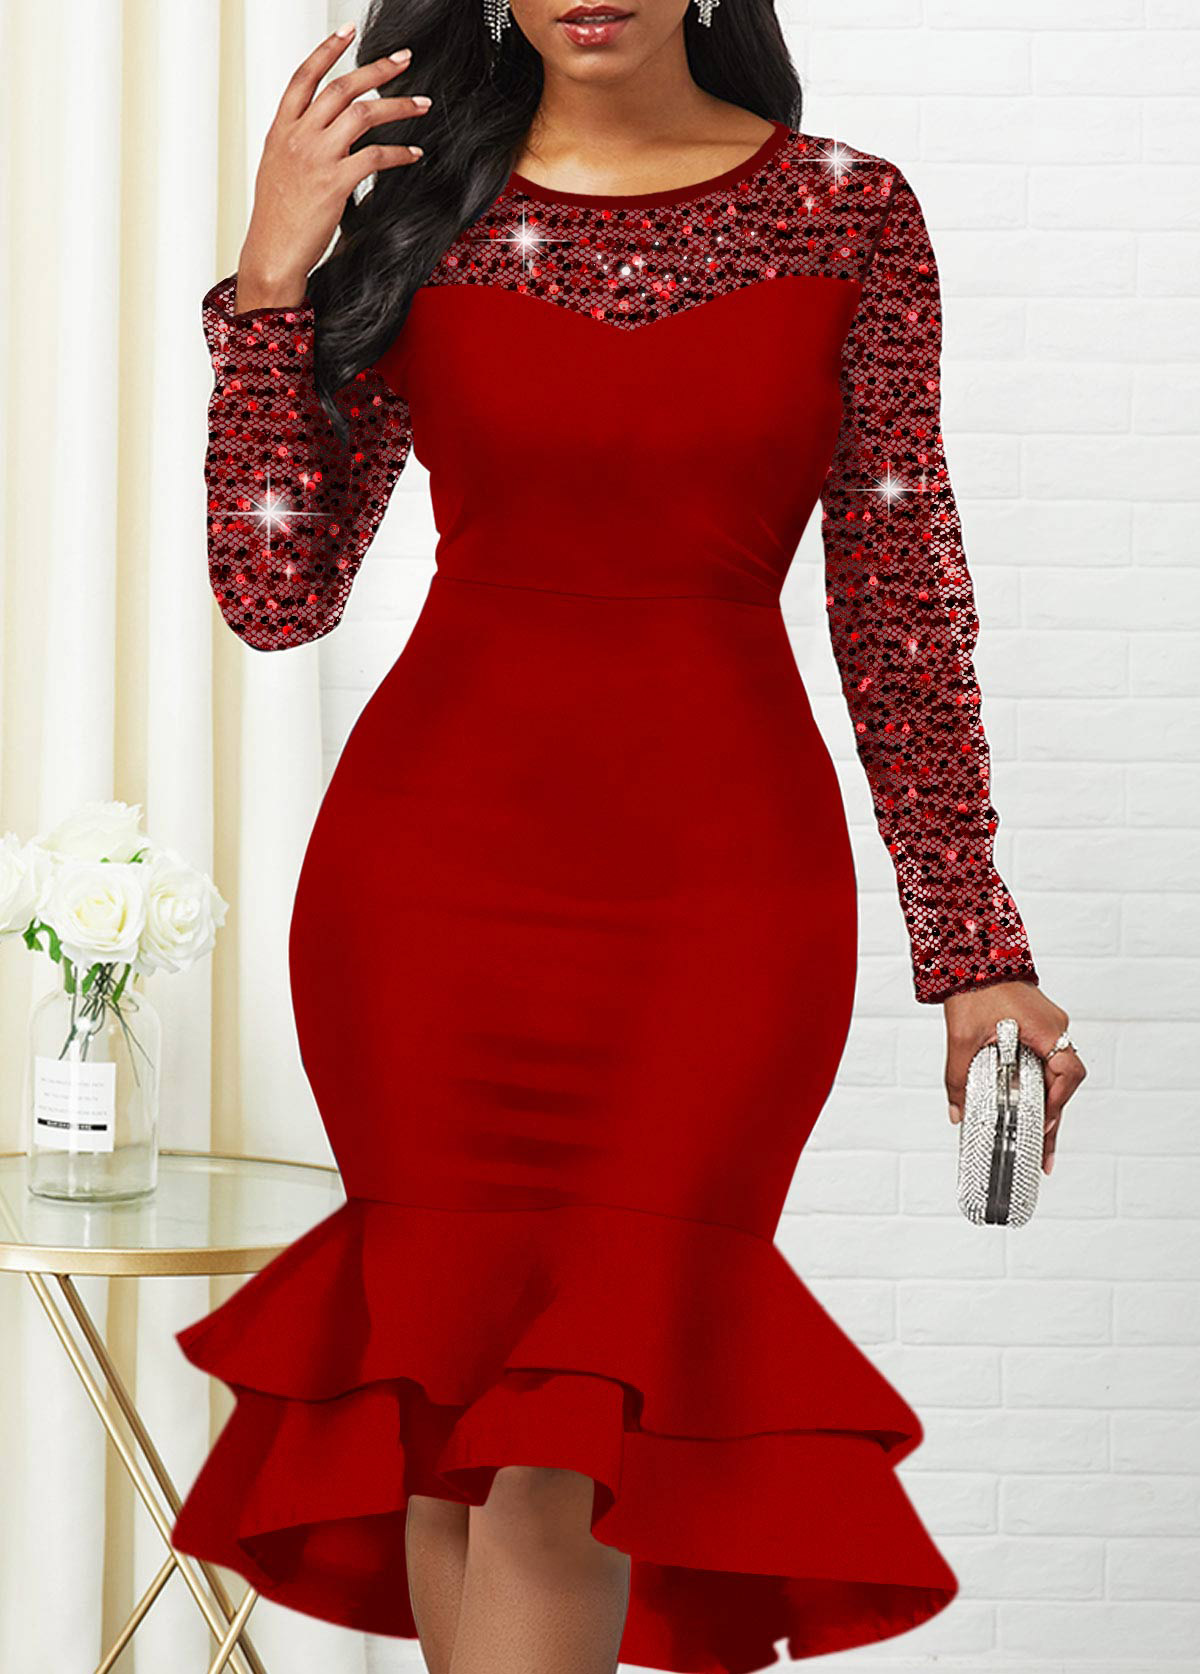 Sequin Detail Round Neck Long Sleeve Mermaid Dress